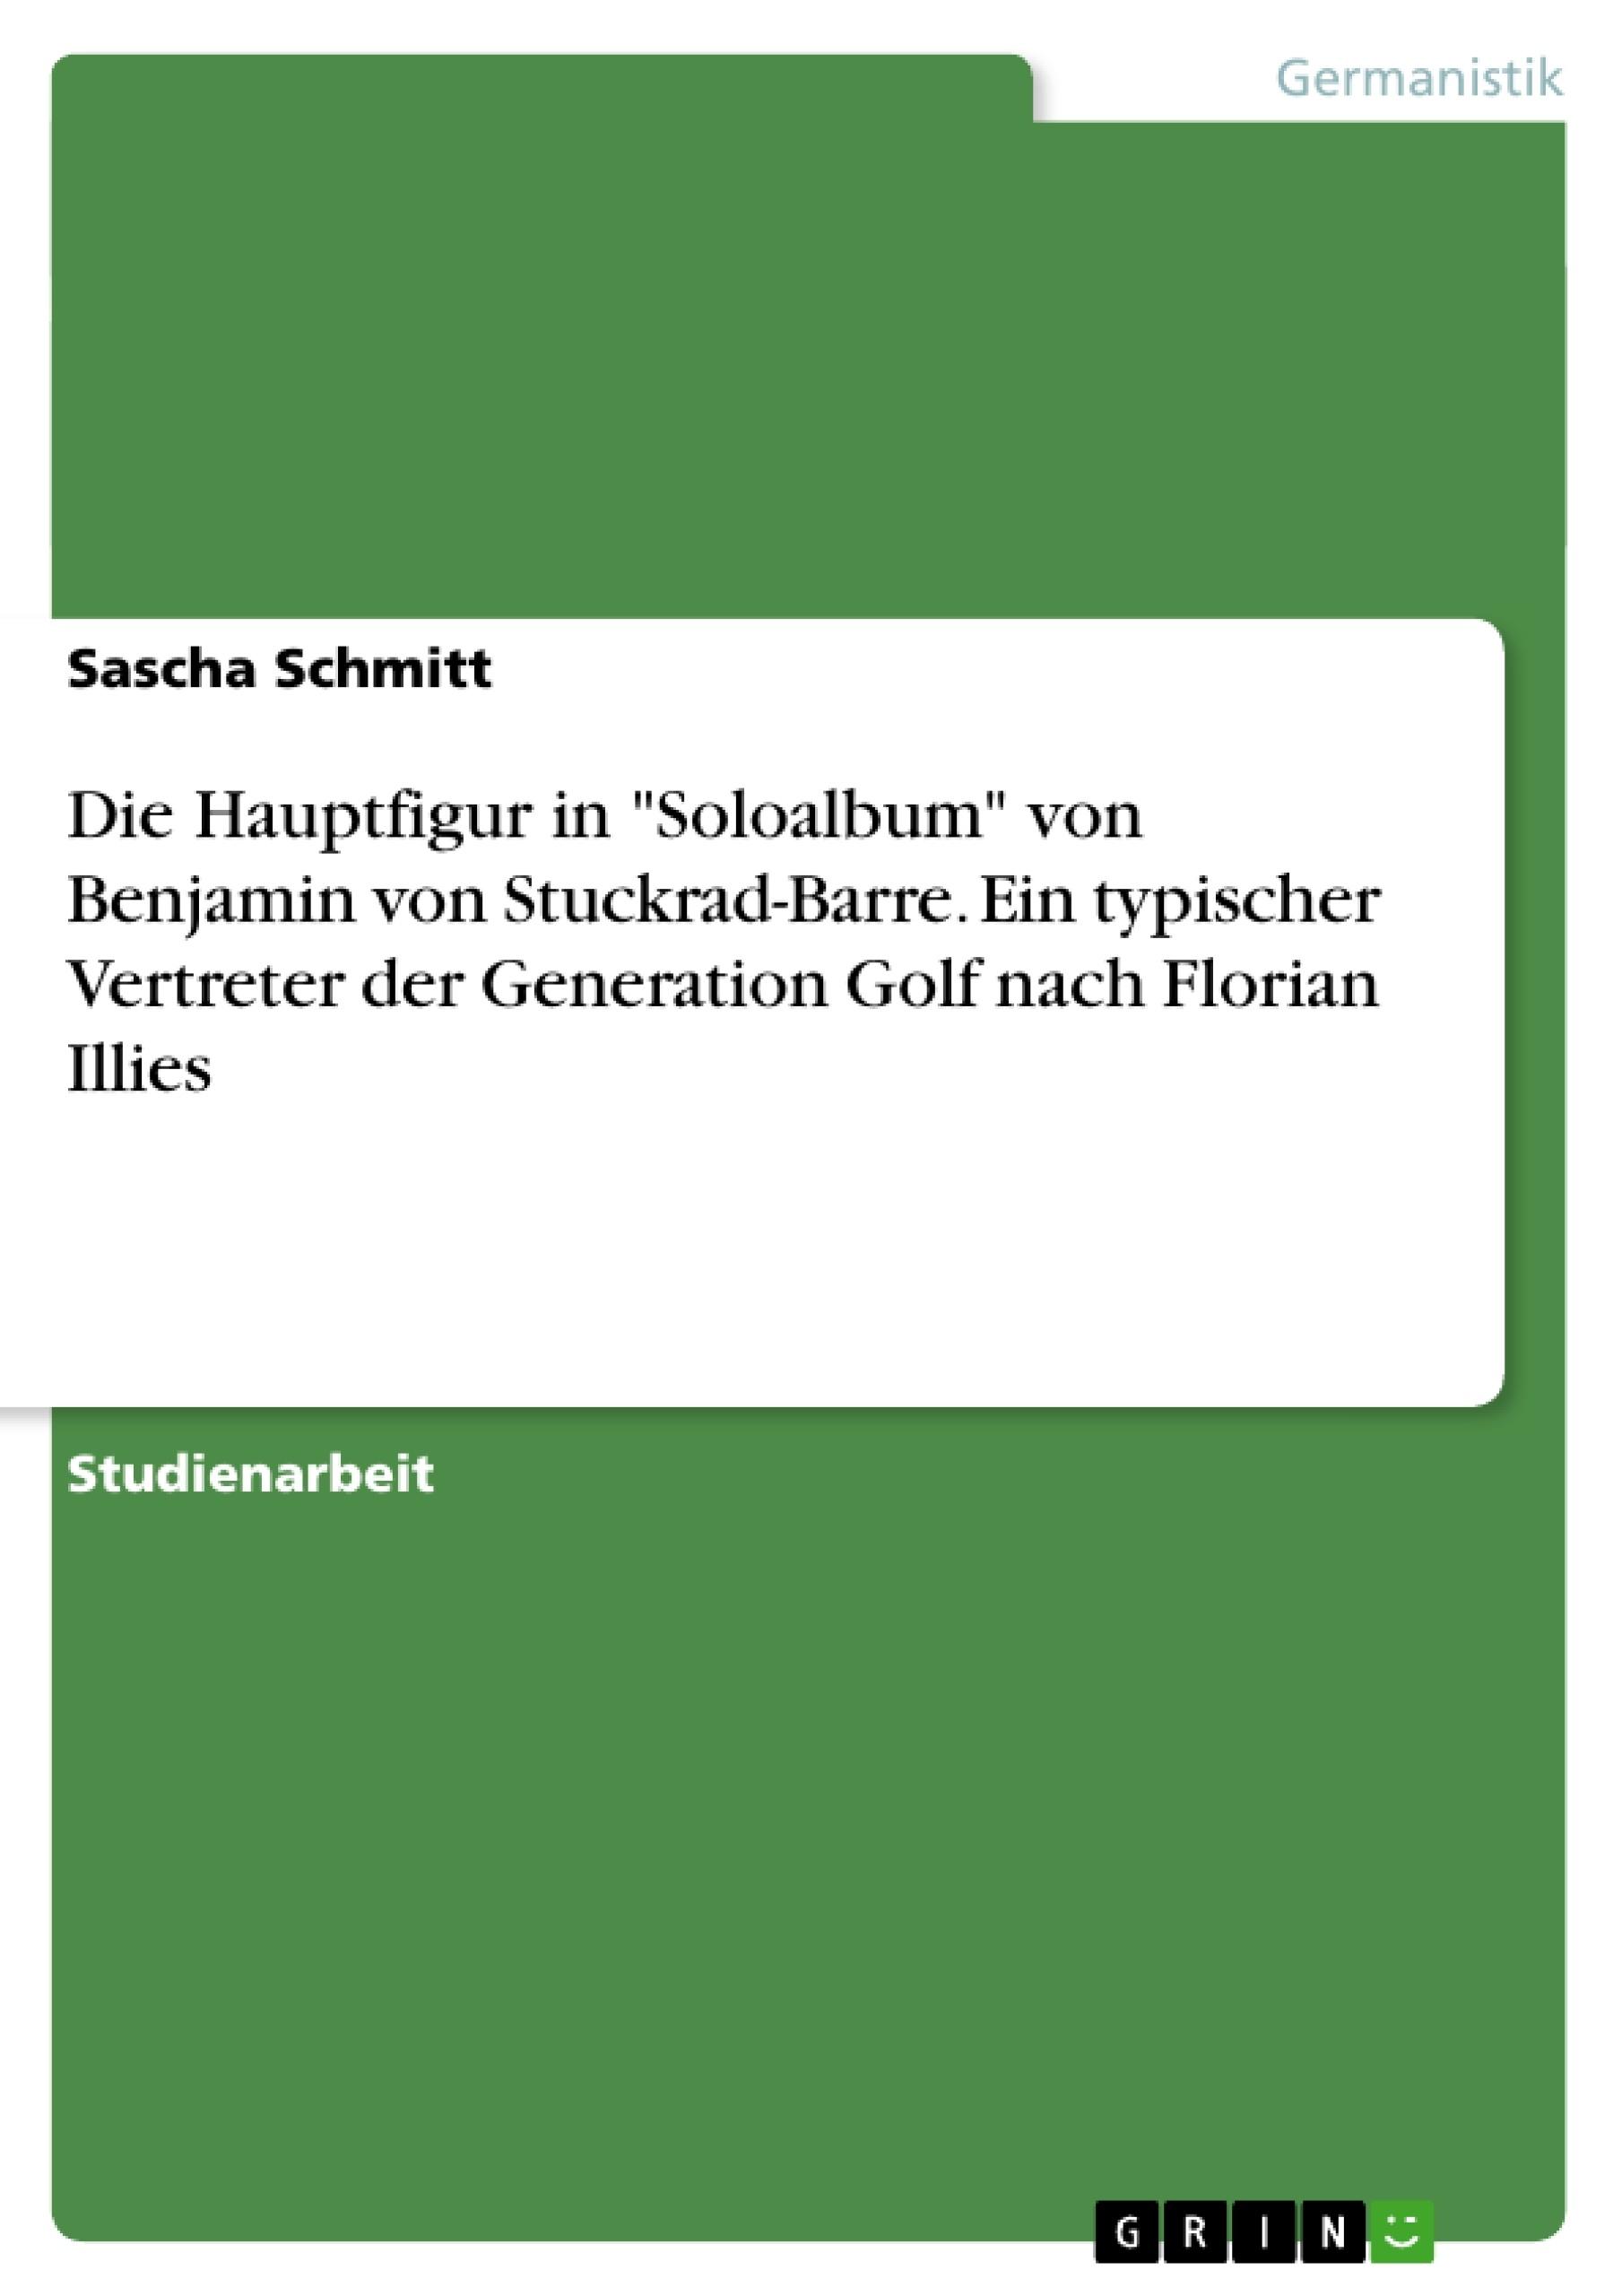 halbwachs thesis